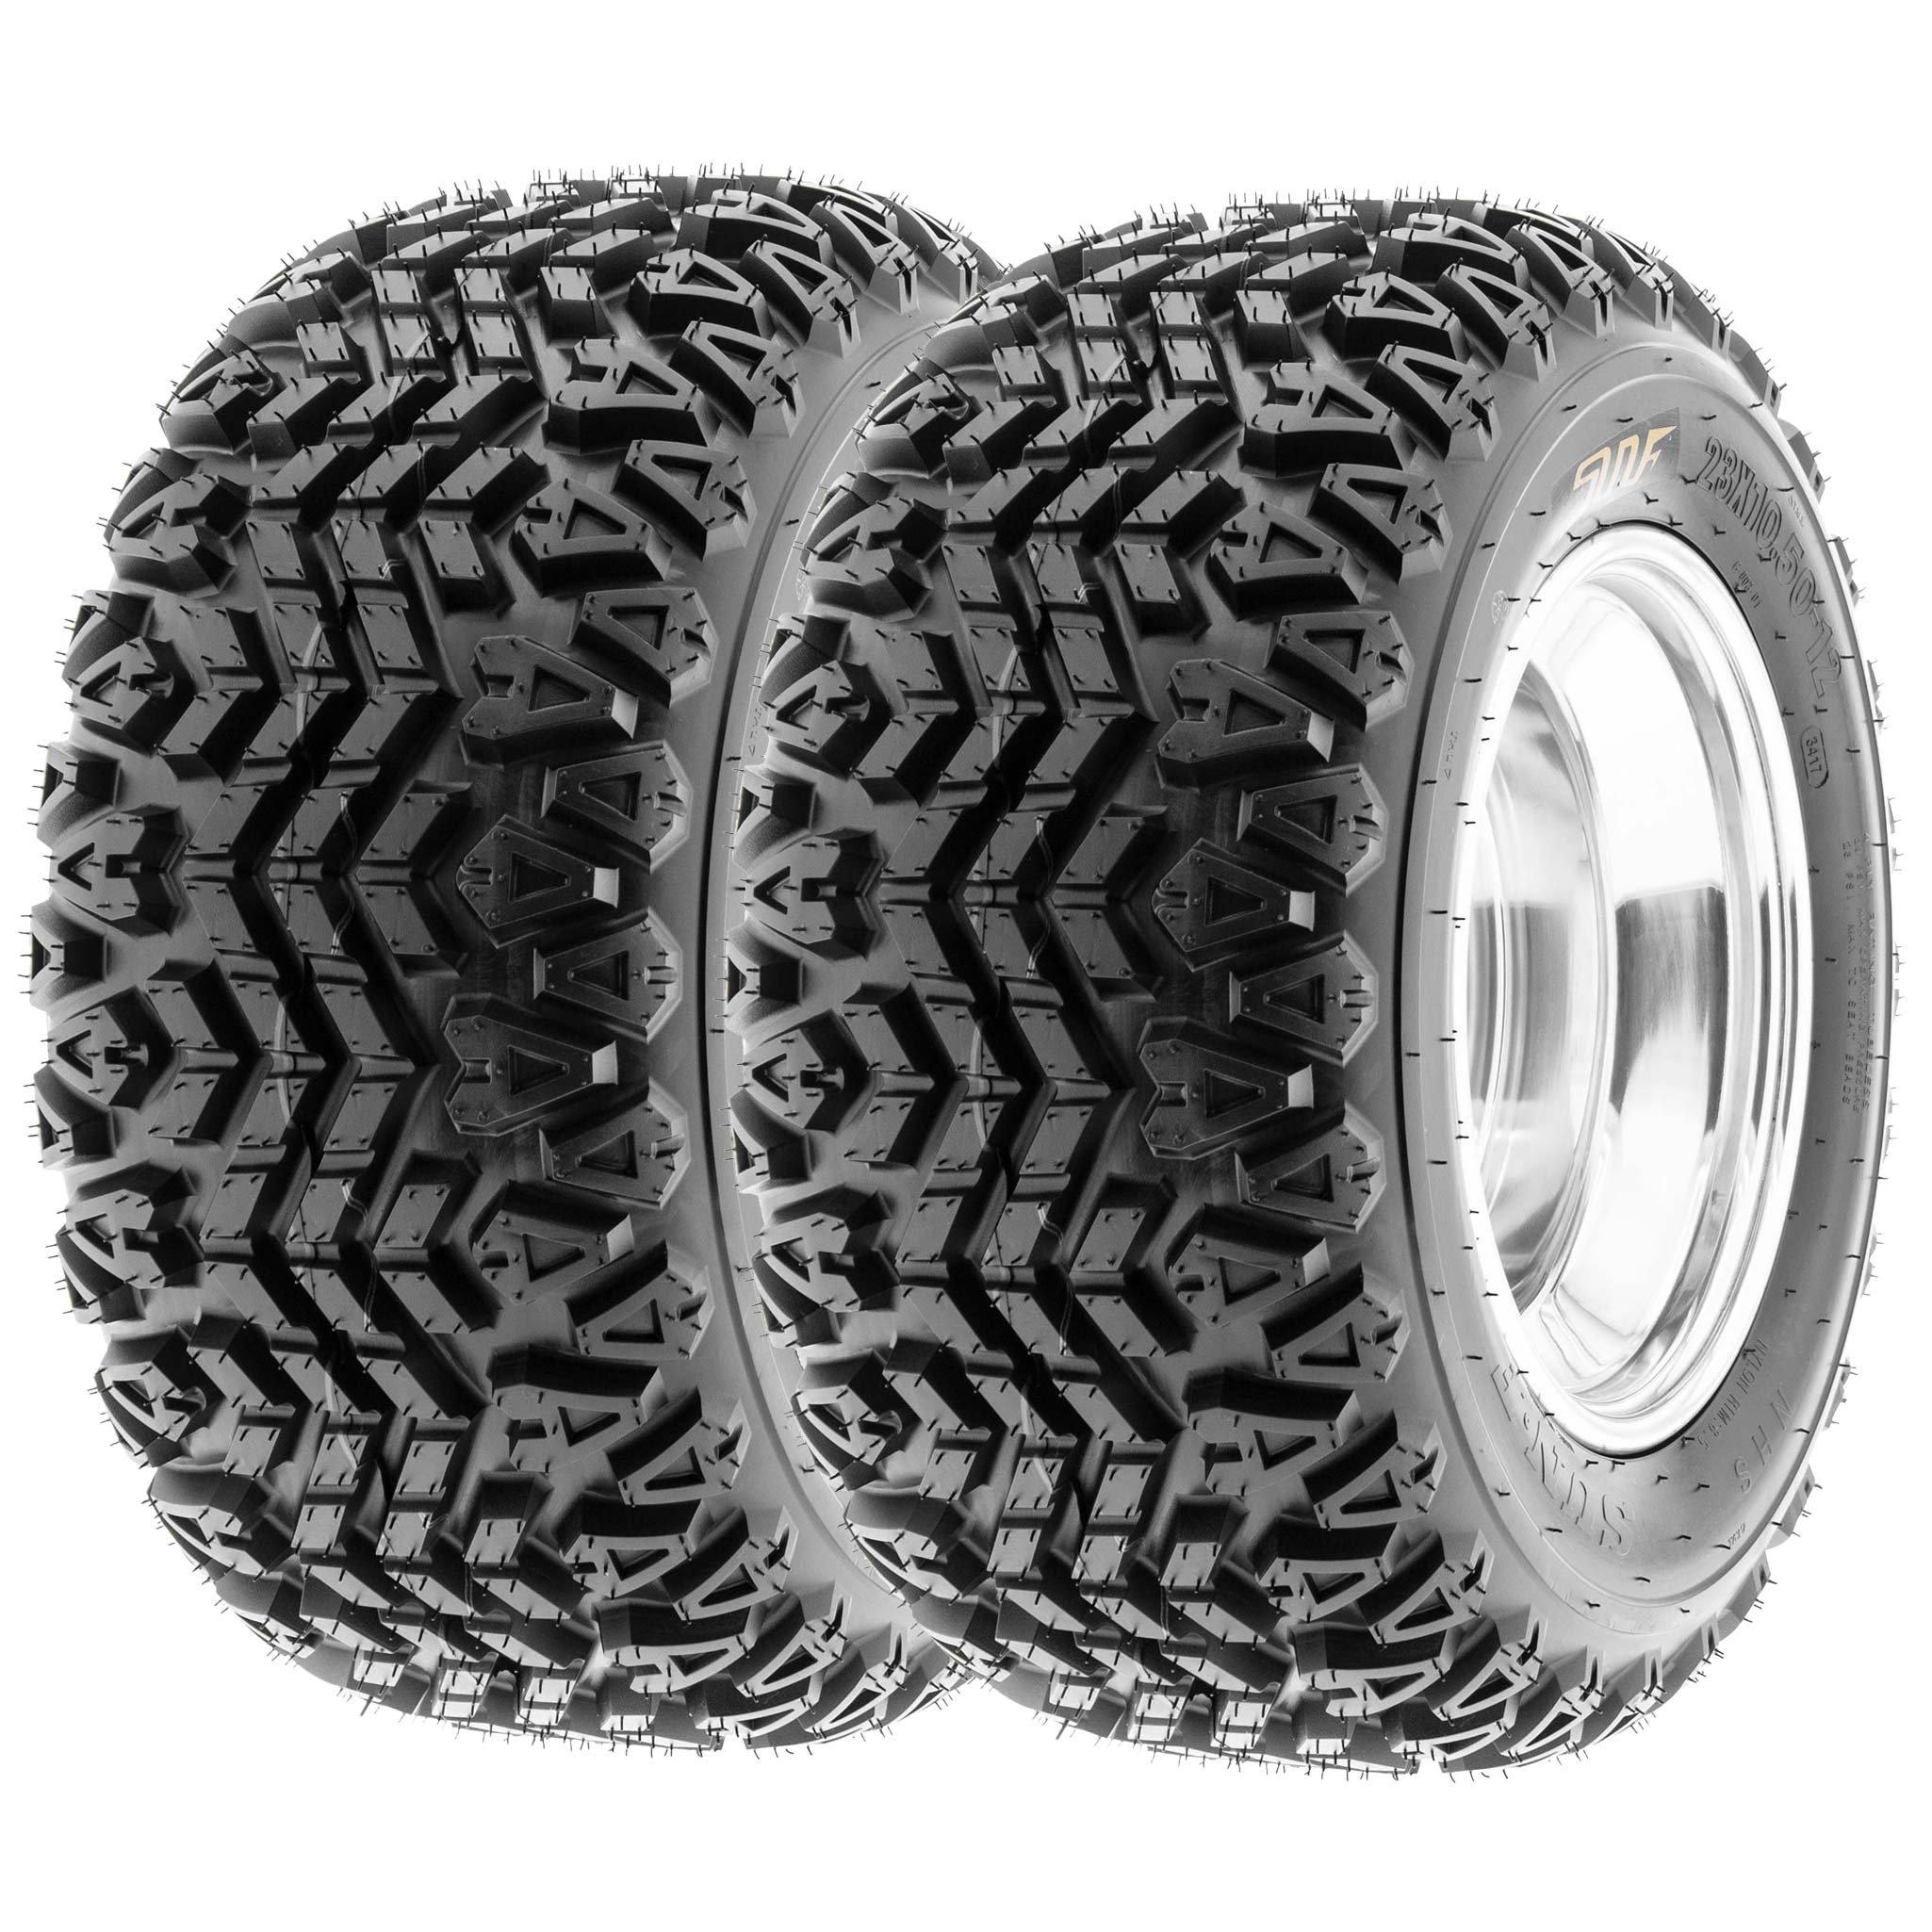 SunF 21x7-10 21x7x10 ATV UTV A/T Golf Cart Tires Race Replacement 4 PR Tubeless Tires G003, [Set of 2]